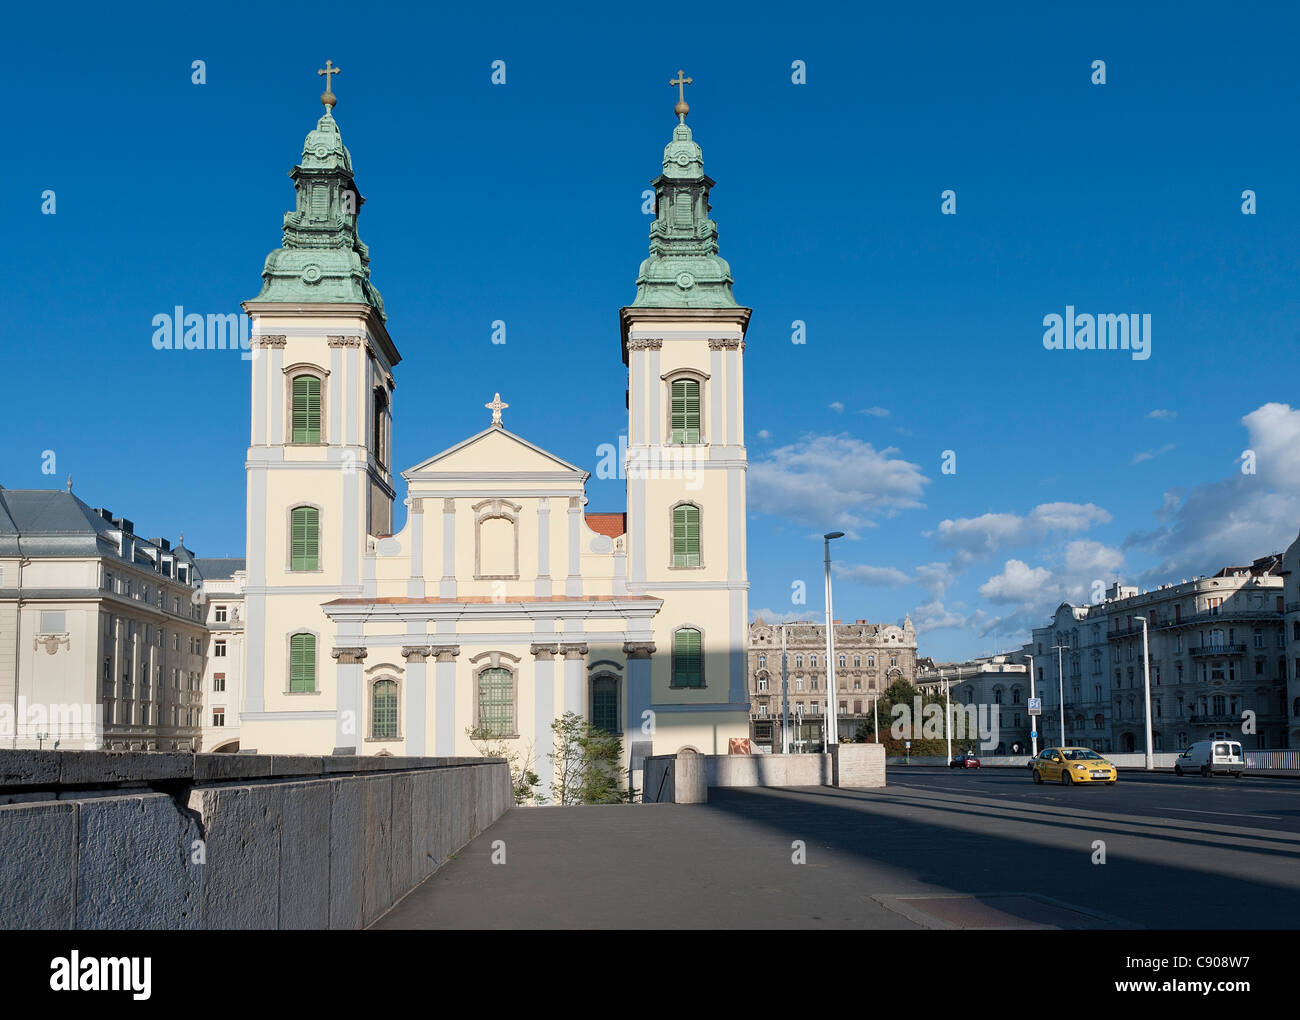 Belvárosi plébánia templom, Inner City Parish Church, Budapest - Stock Image